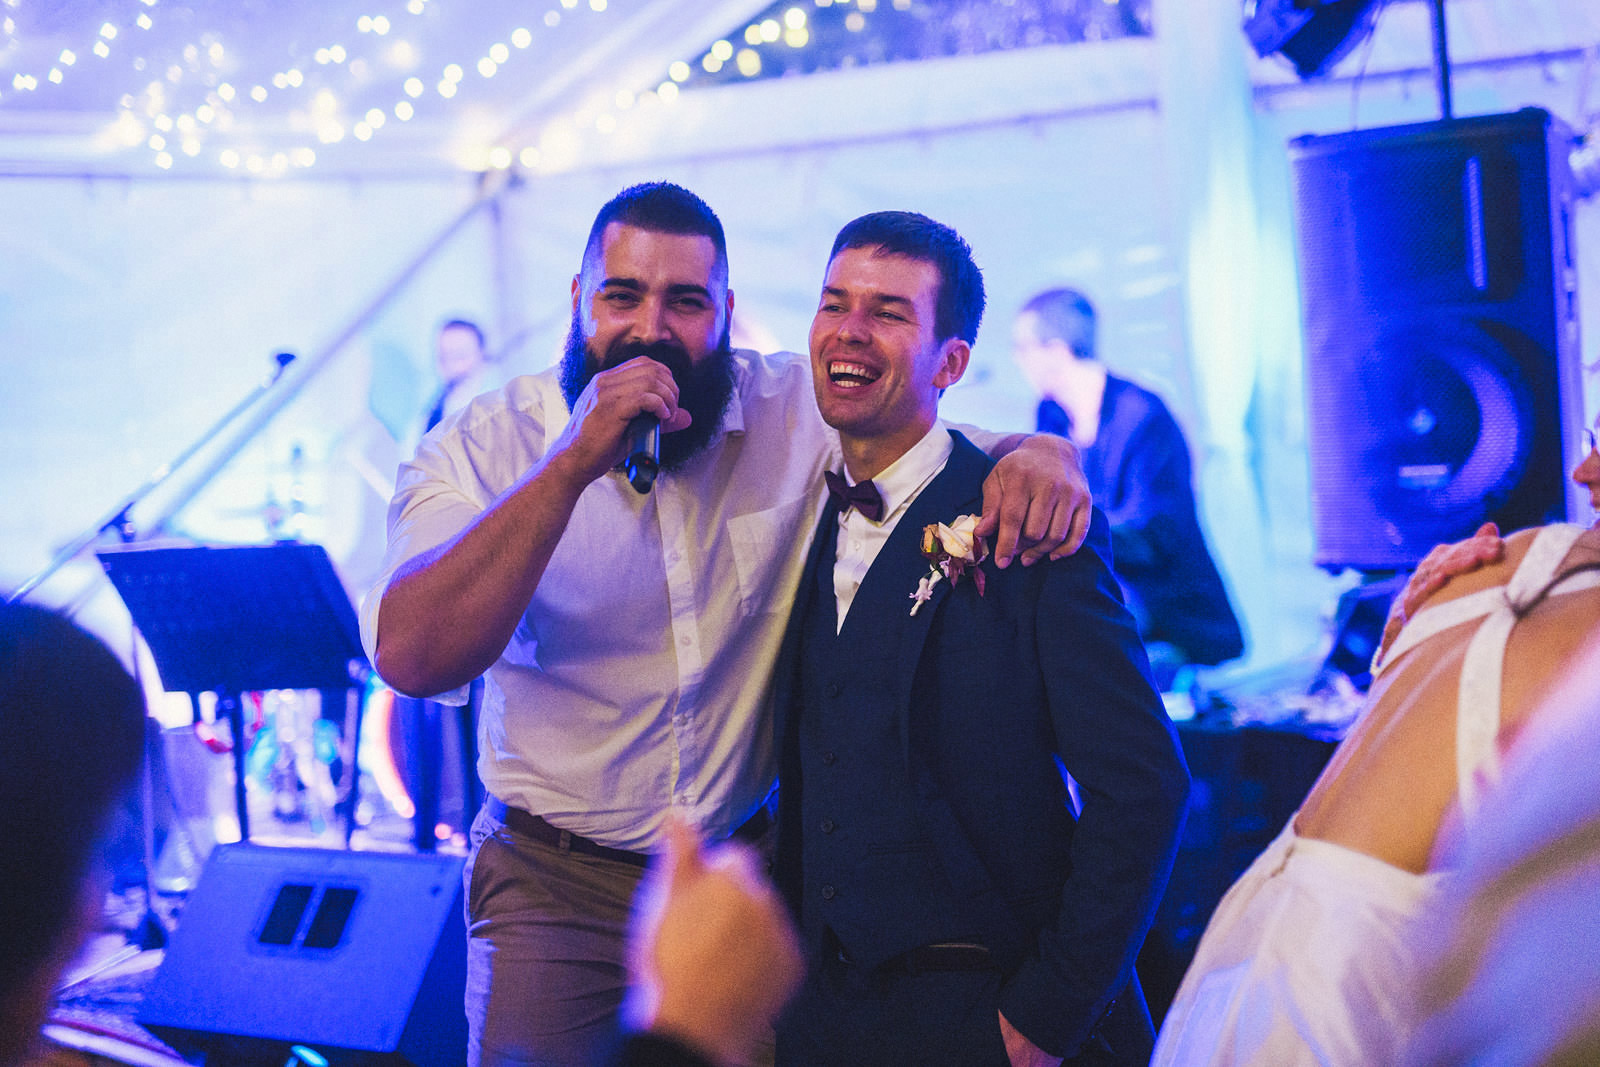 tablelands_wedding_0078